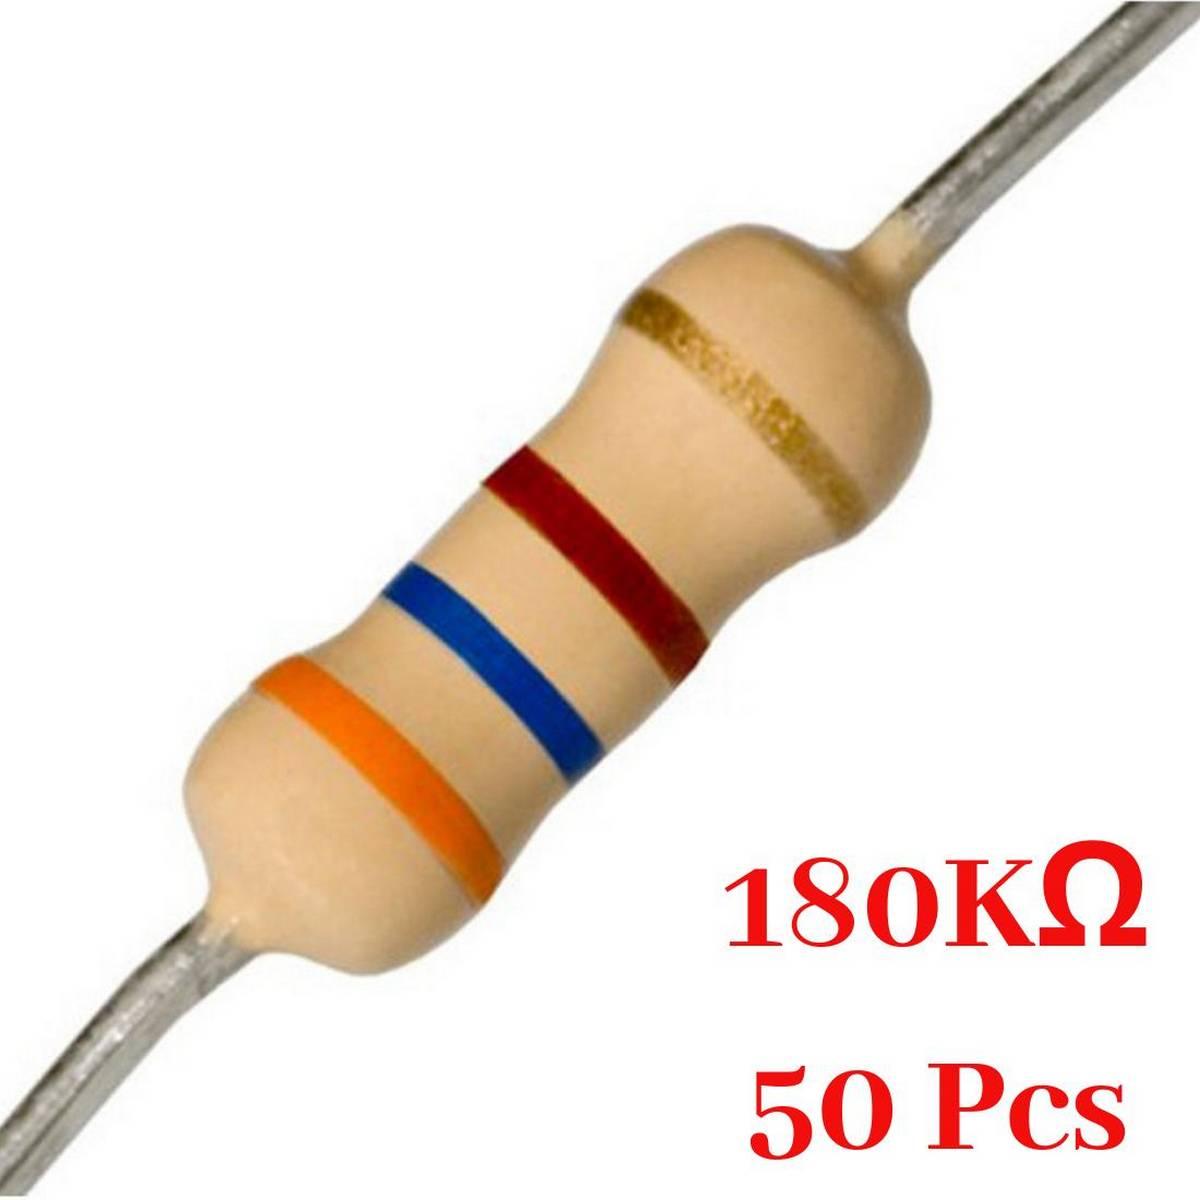 50 Pcs- 180K Ohm resistor